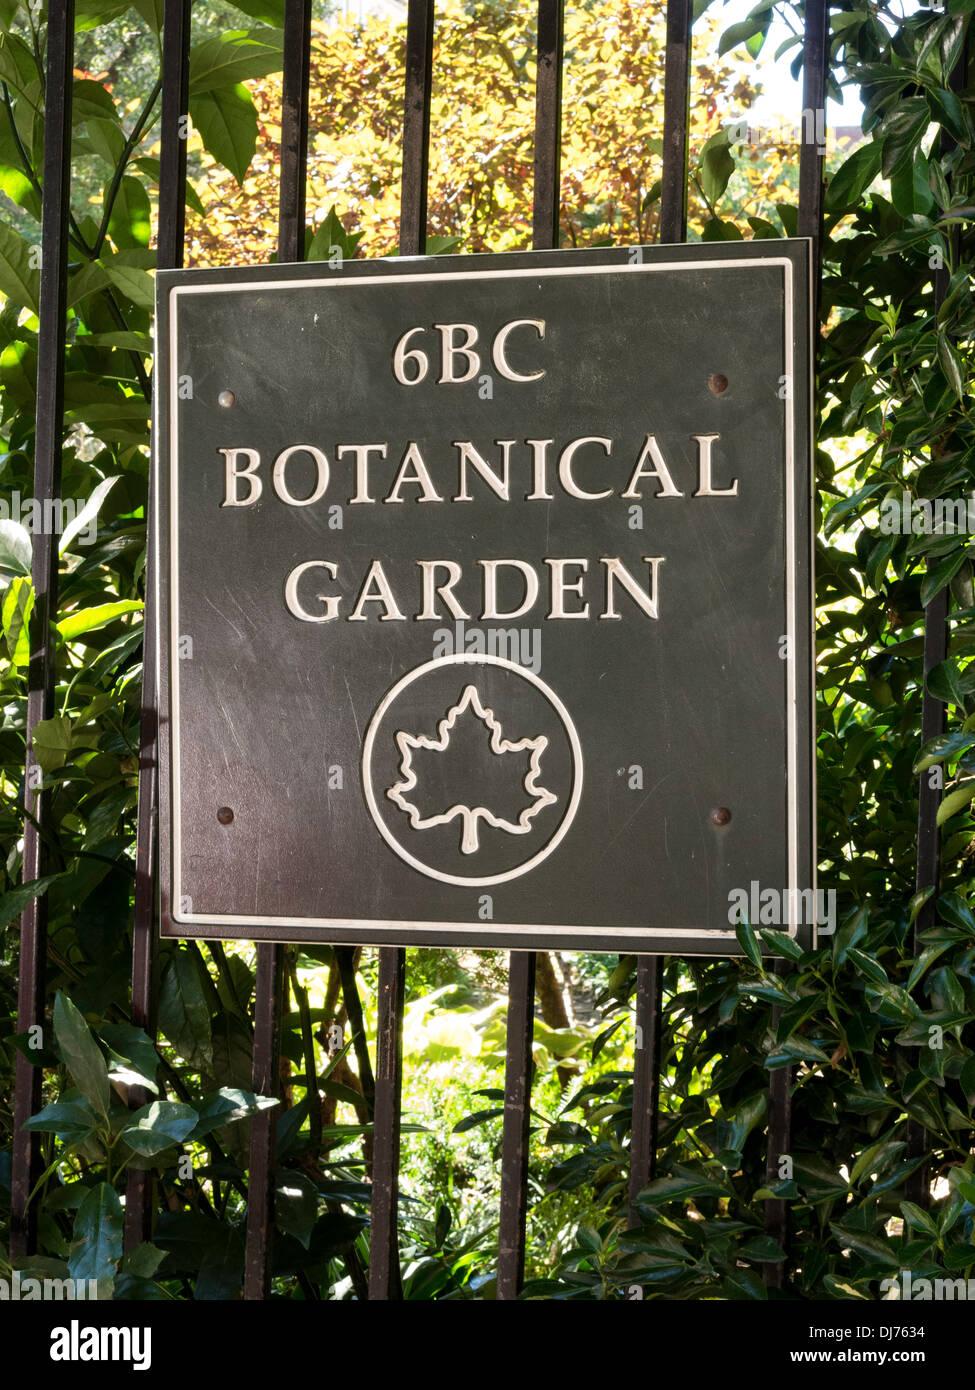 6BC Botanical Garden Sign, NYC Stock Photo: 62853368 - Alamy